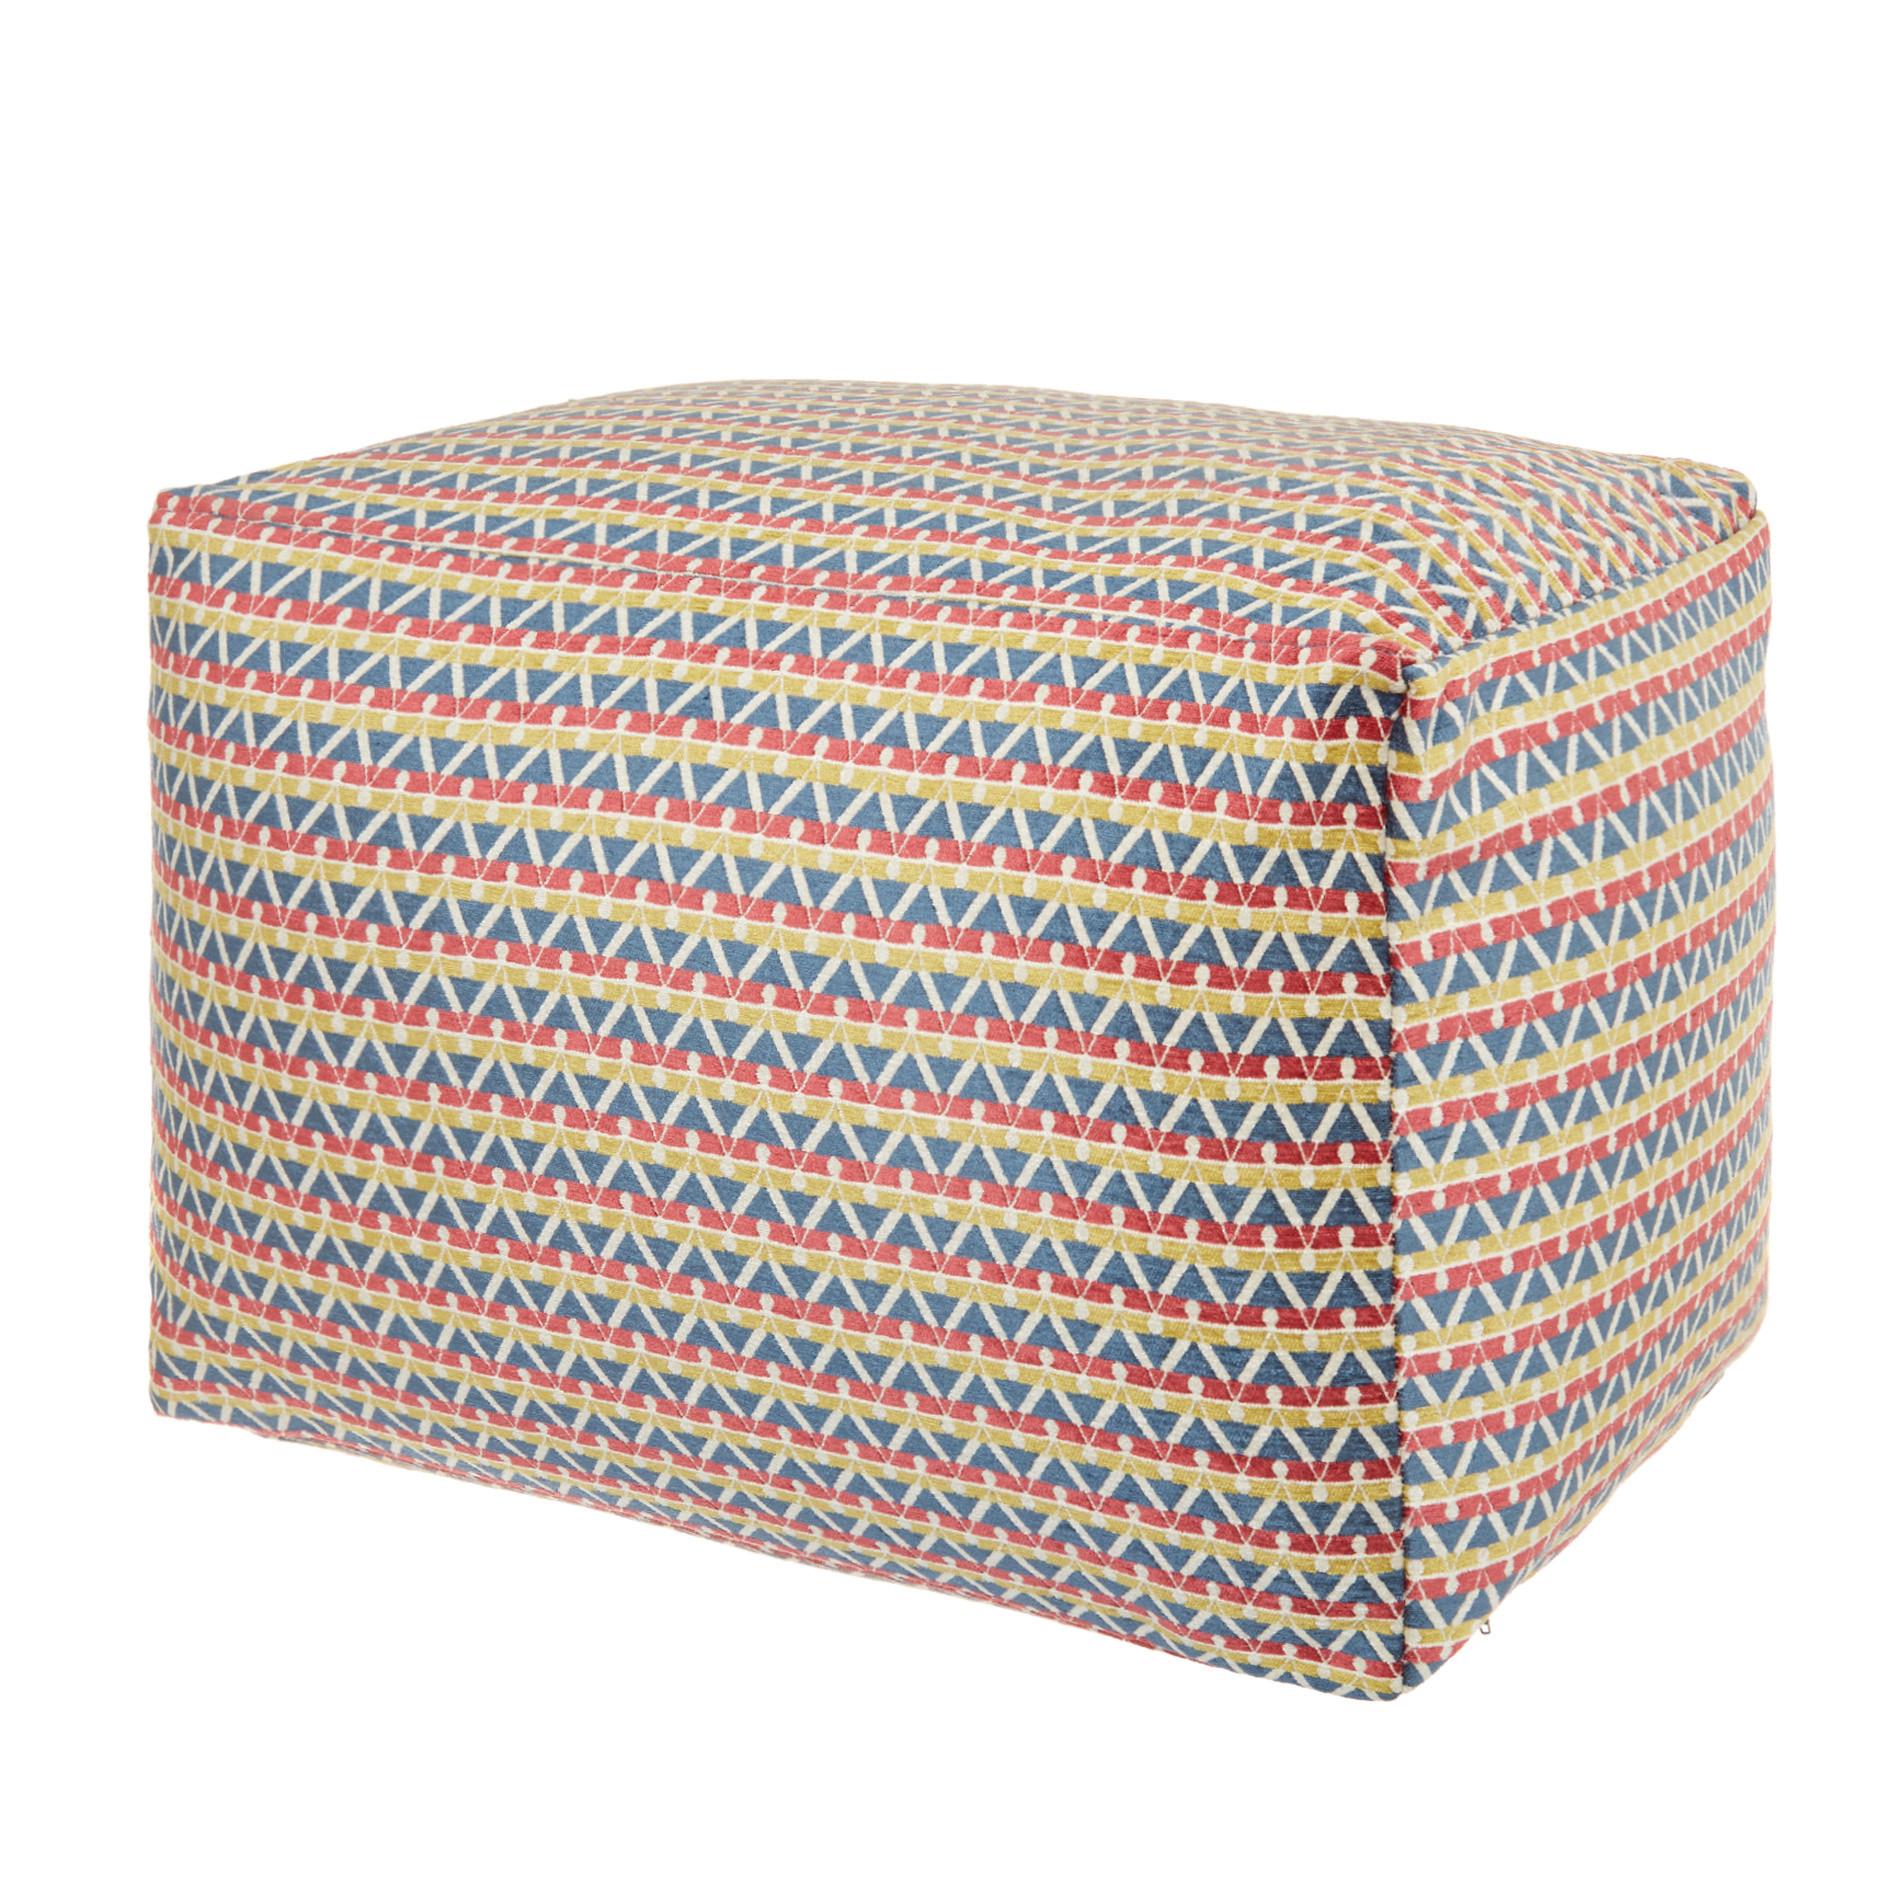 Pouf tessuto jacquard motivo geometrico, Multicolor, large image number 0